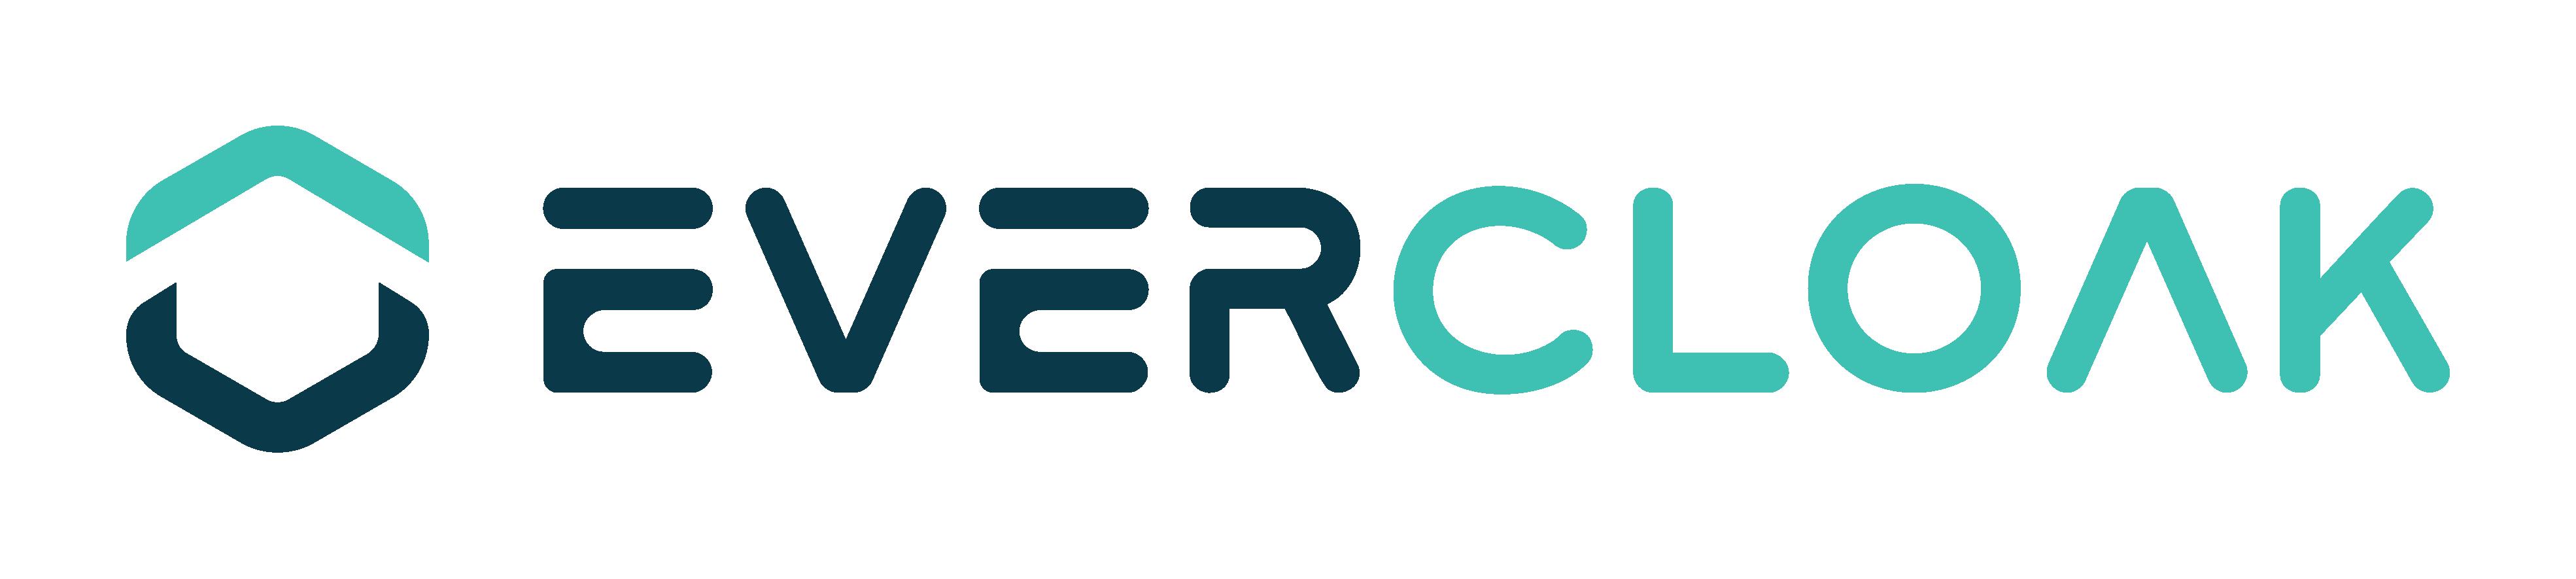 Evercloak logo